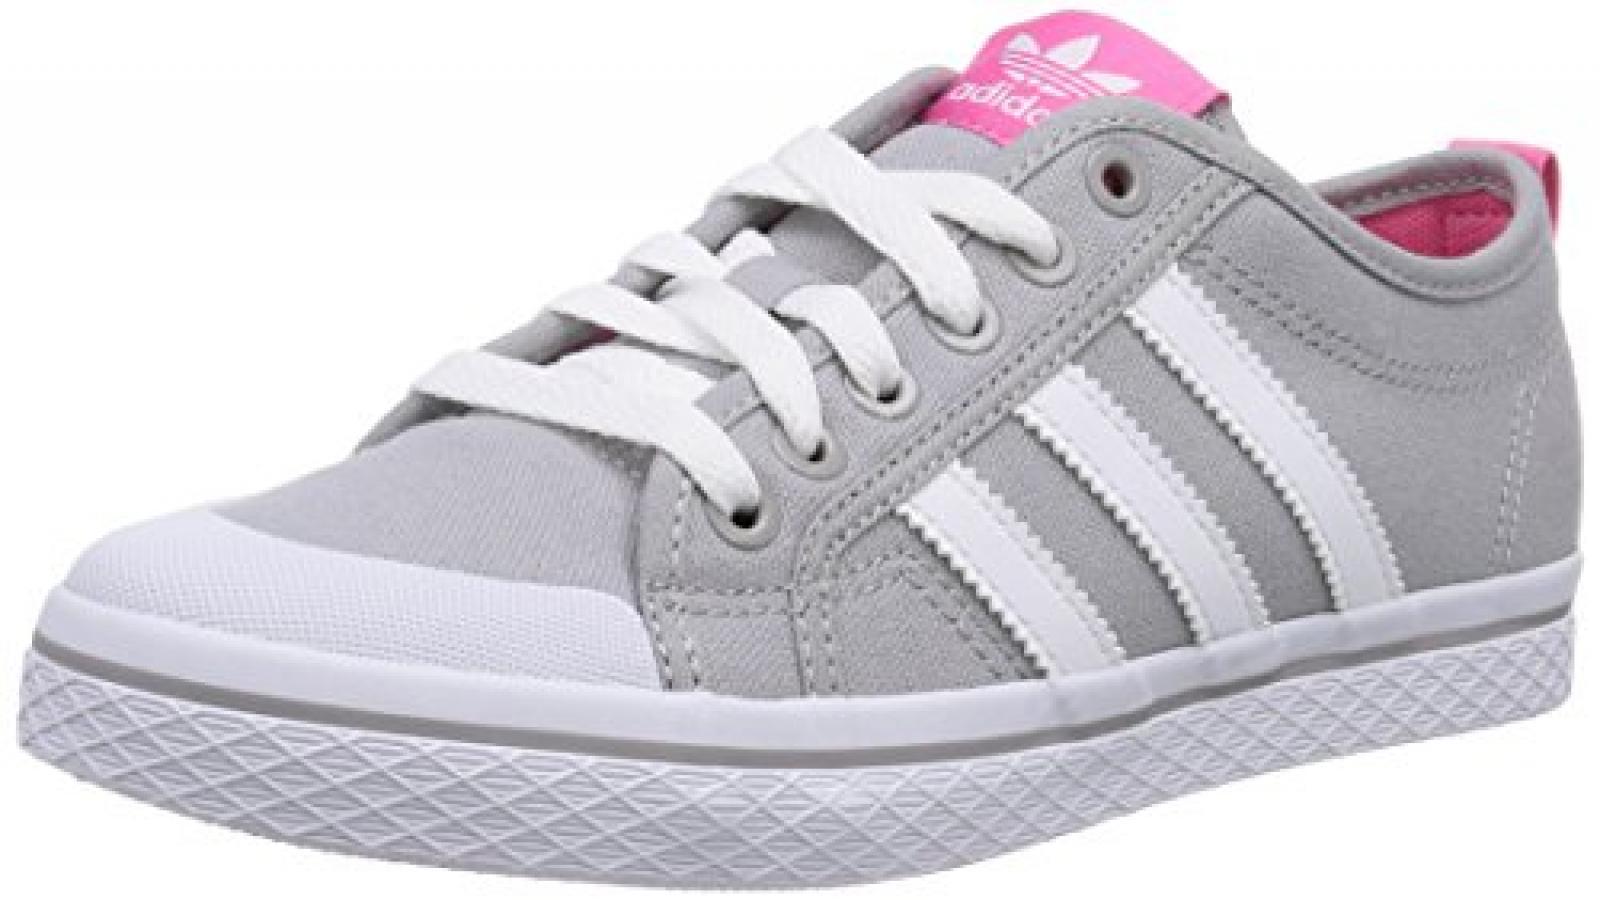 adidas Originals Honey Low Damen Sneakers